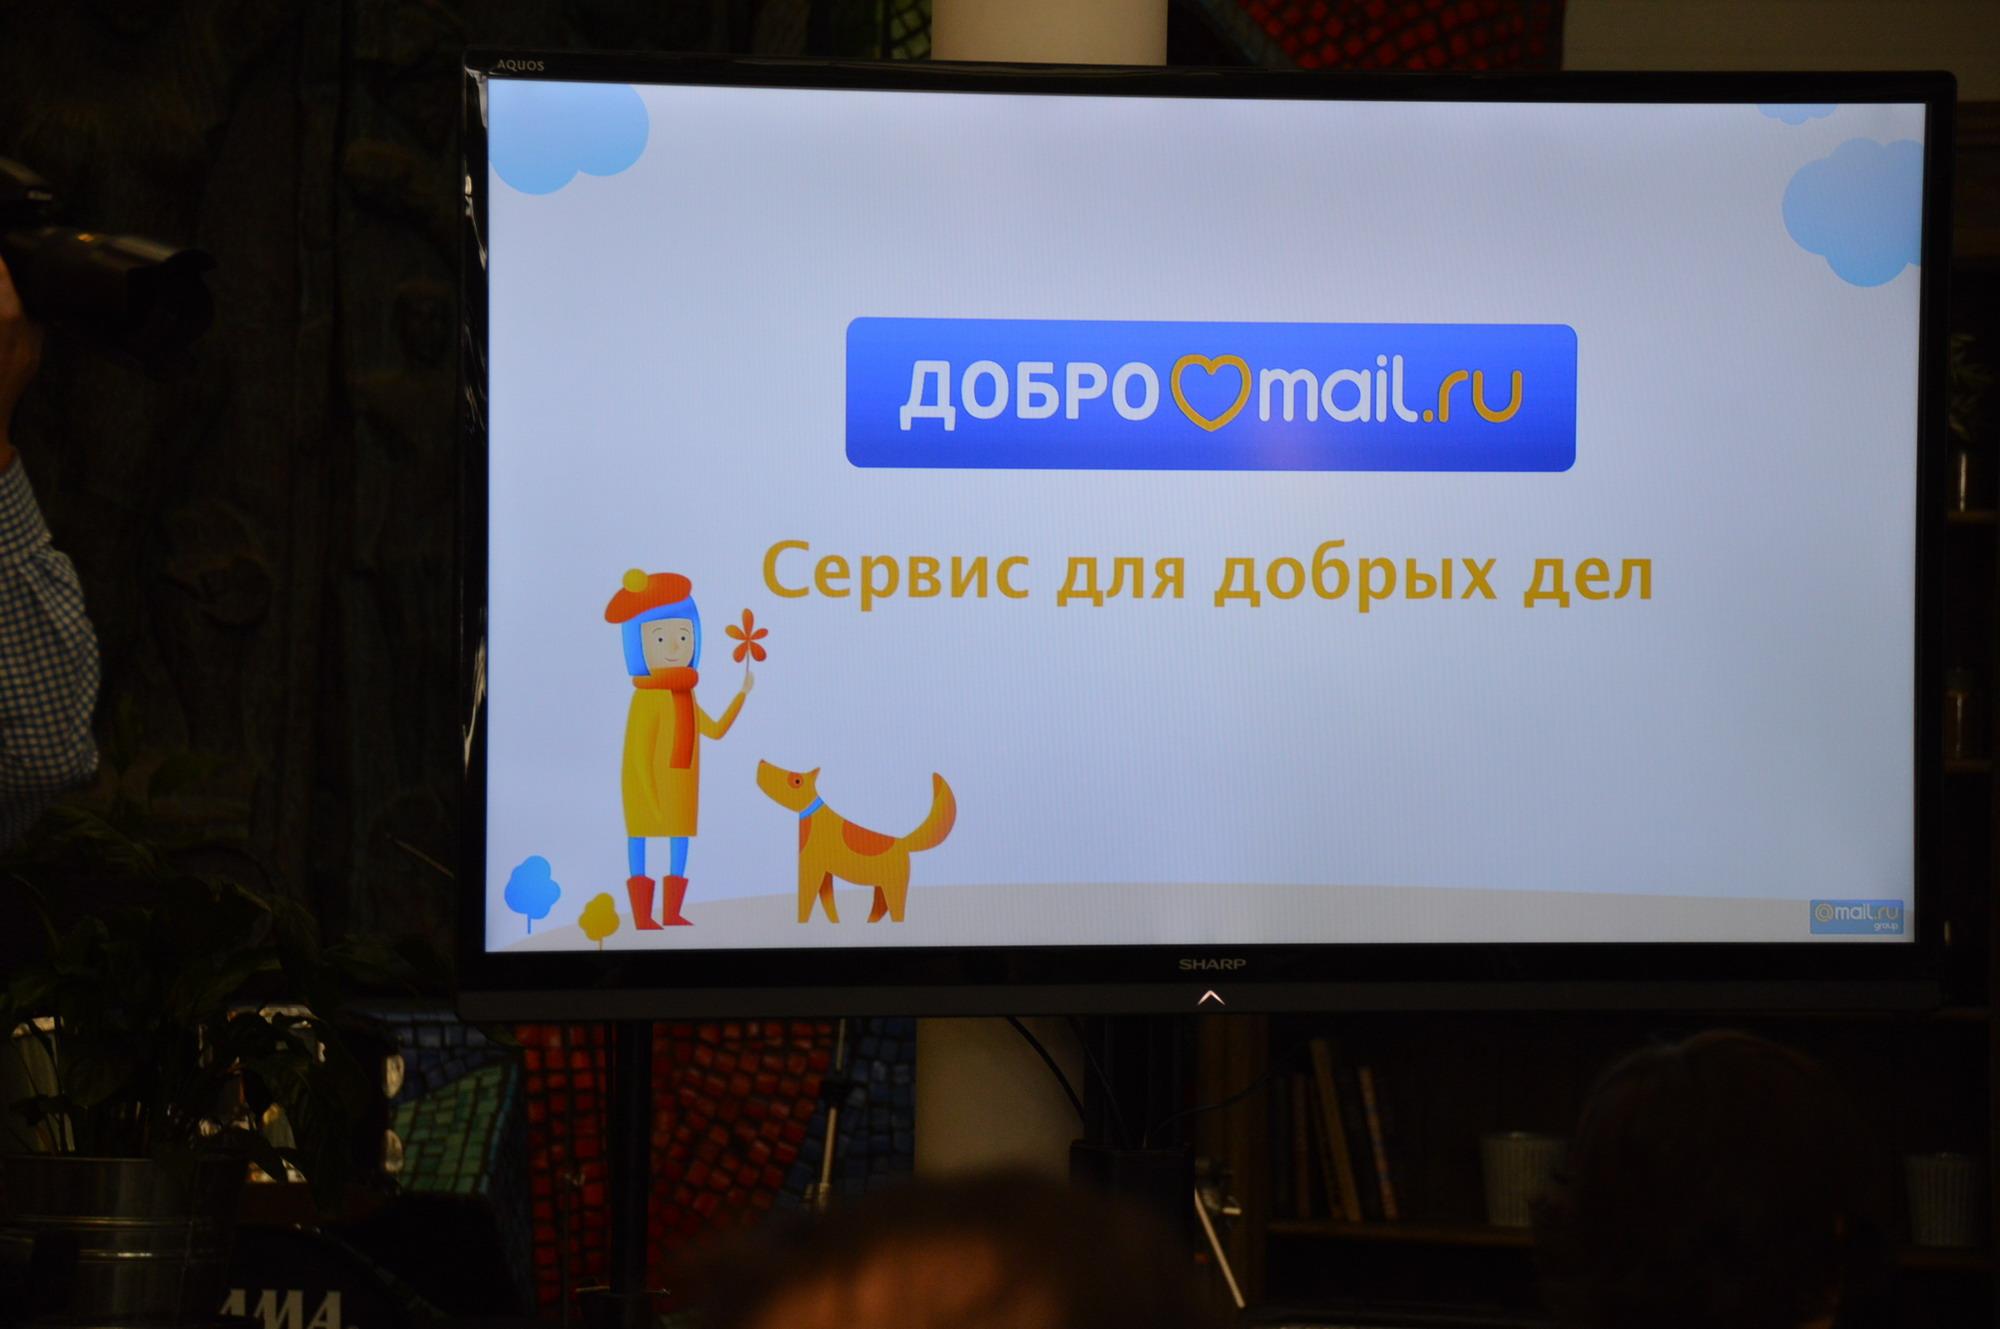 Даниловцы на Добро Mail.ru